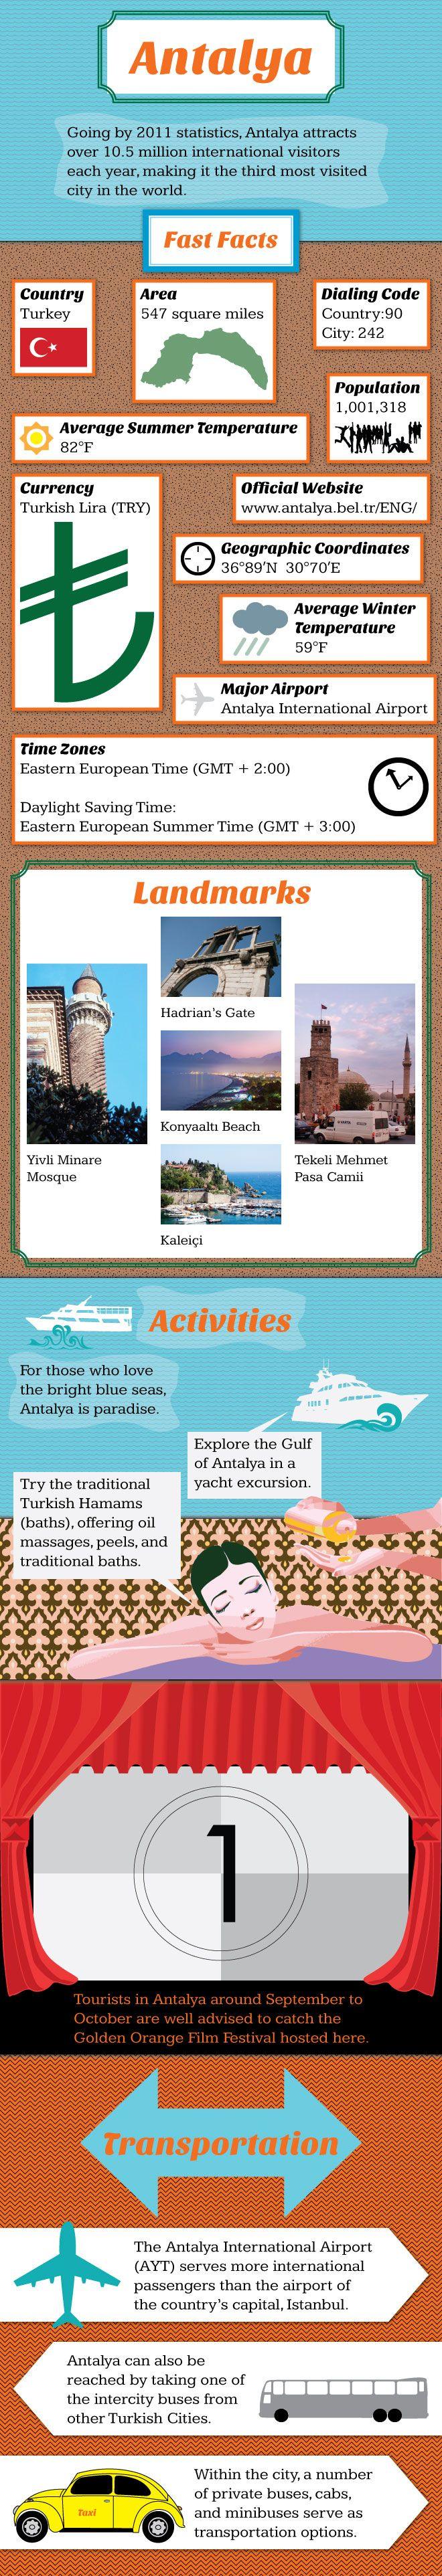 Antalya #Travel #Infographic http://travel.mapsofworld.com/infographics/antalya